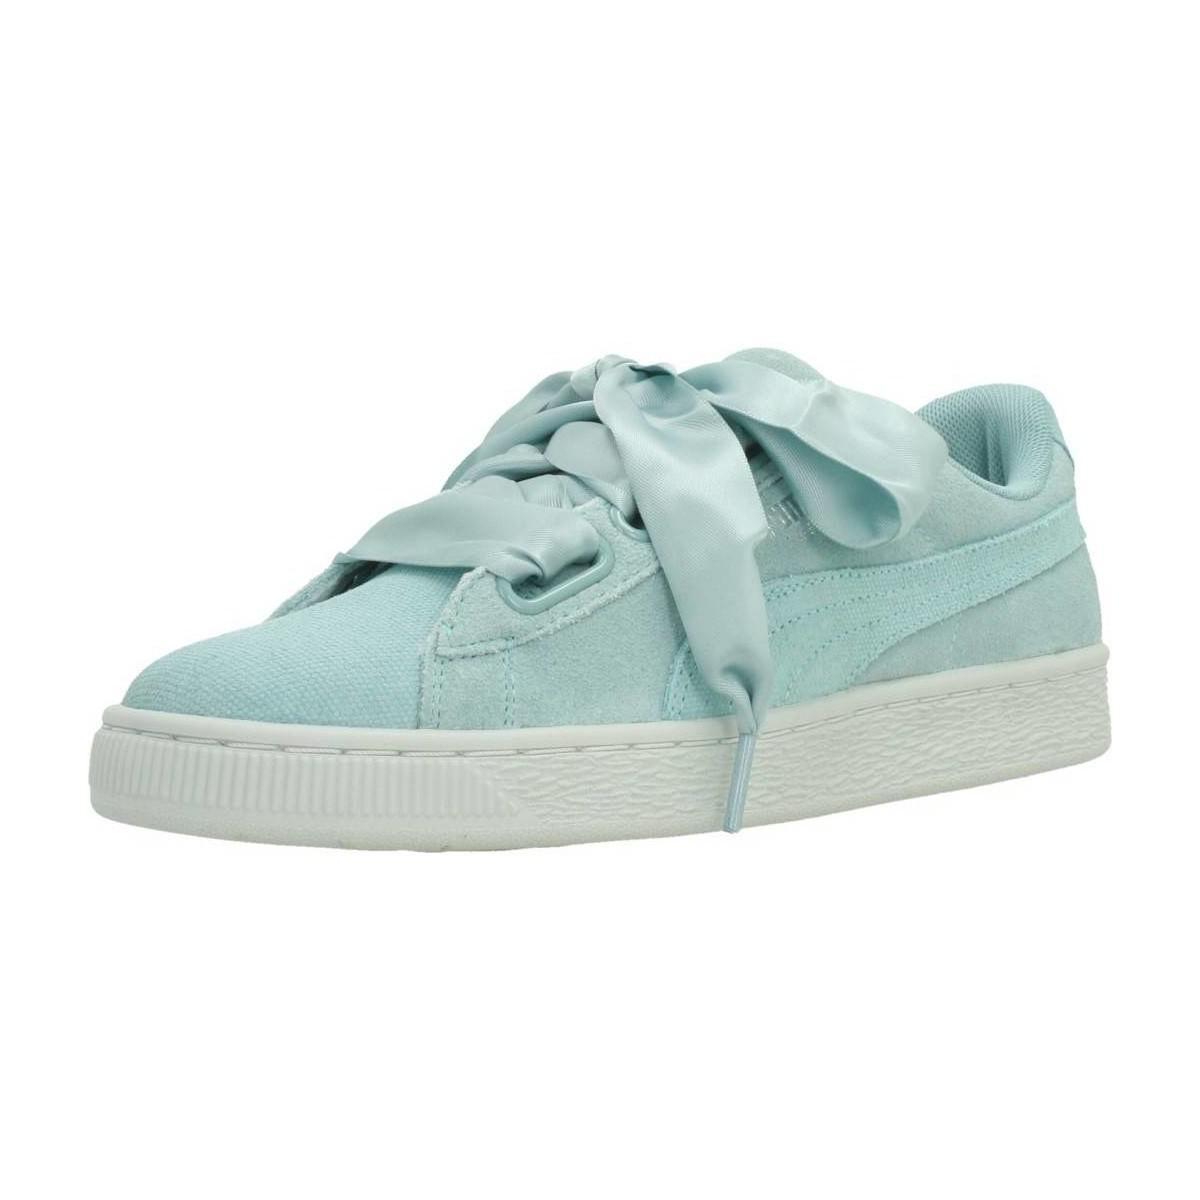 3e3b9389e0f88b Puma Heart Pebble Women s Shoes (trainers) In Blue in Blue - Lyst